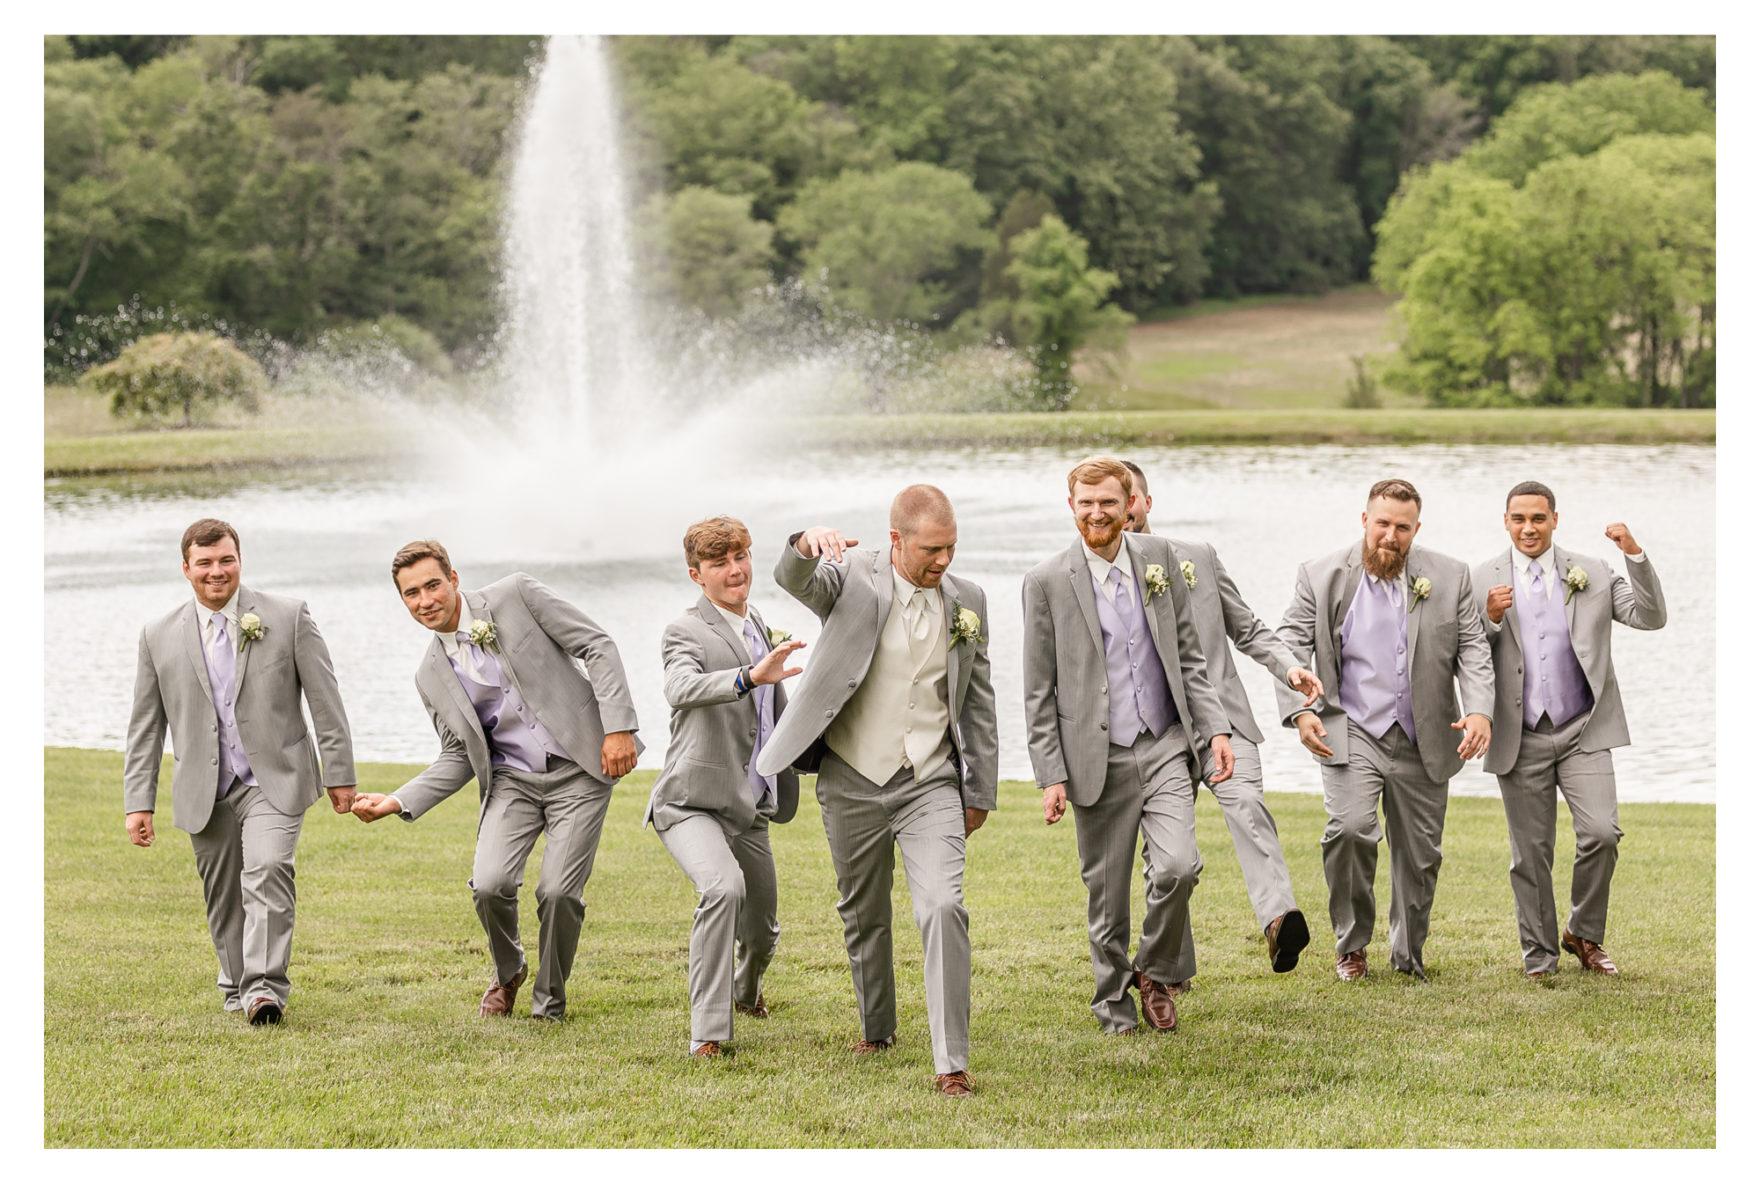 Summer Wedding Stone Ridge Hollow June Wedding Lavender dresses groomsmen